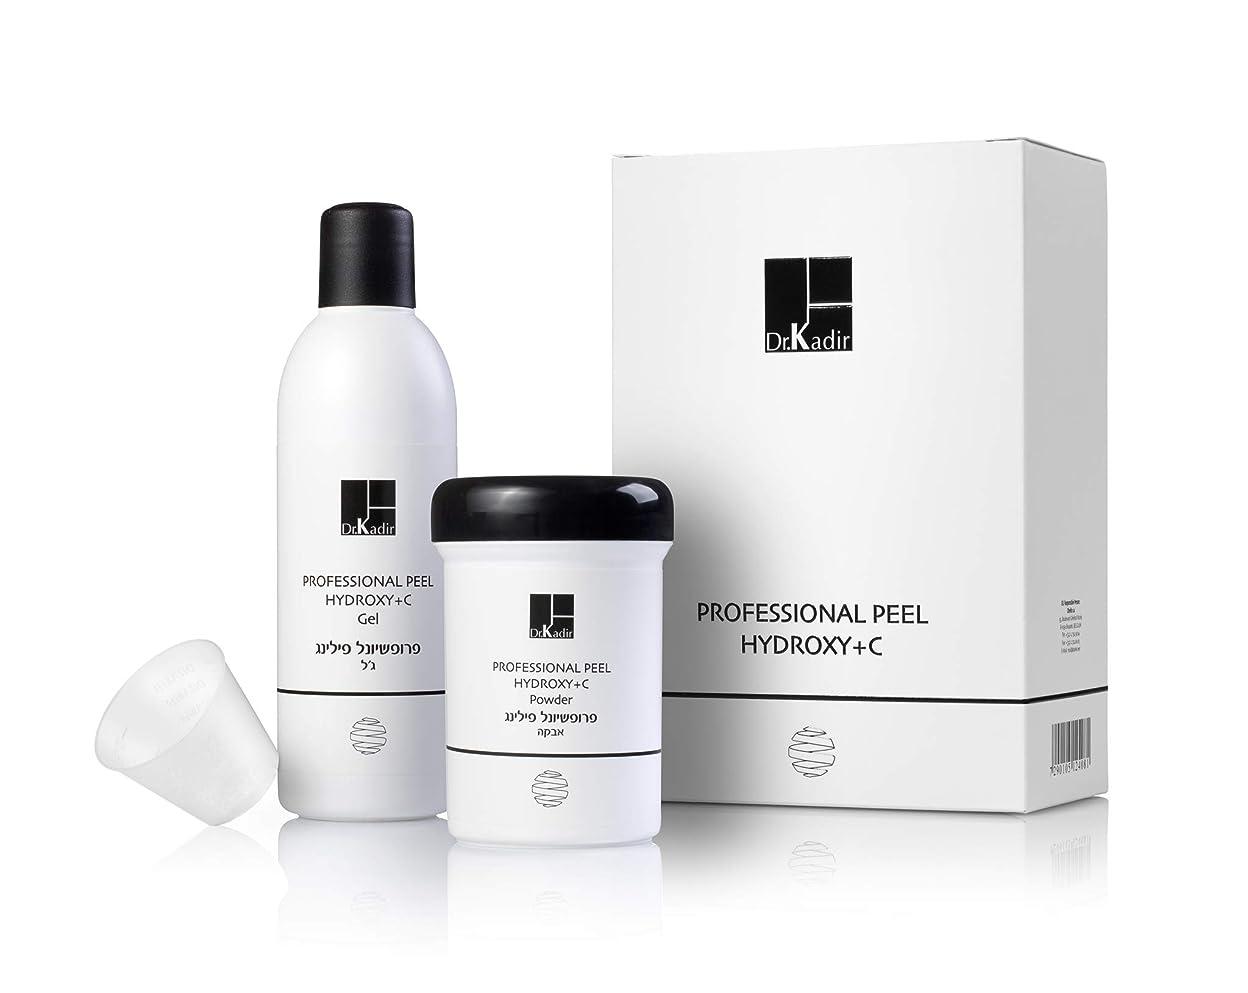 Dr. Kadir Professional Peel Hydroxy+C Set